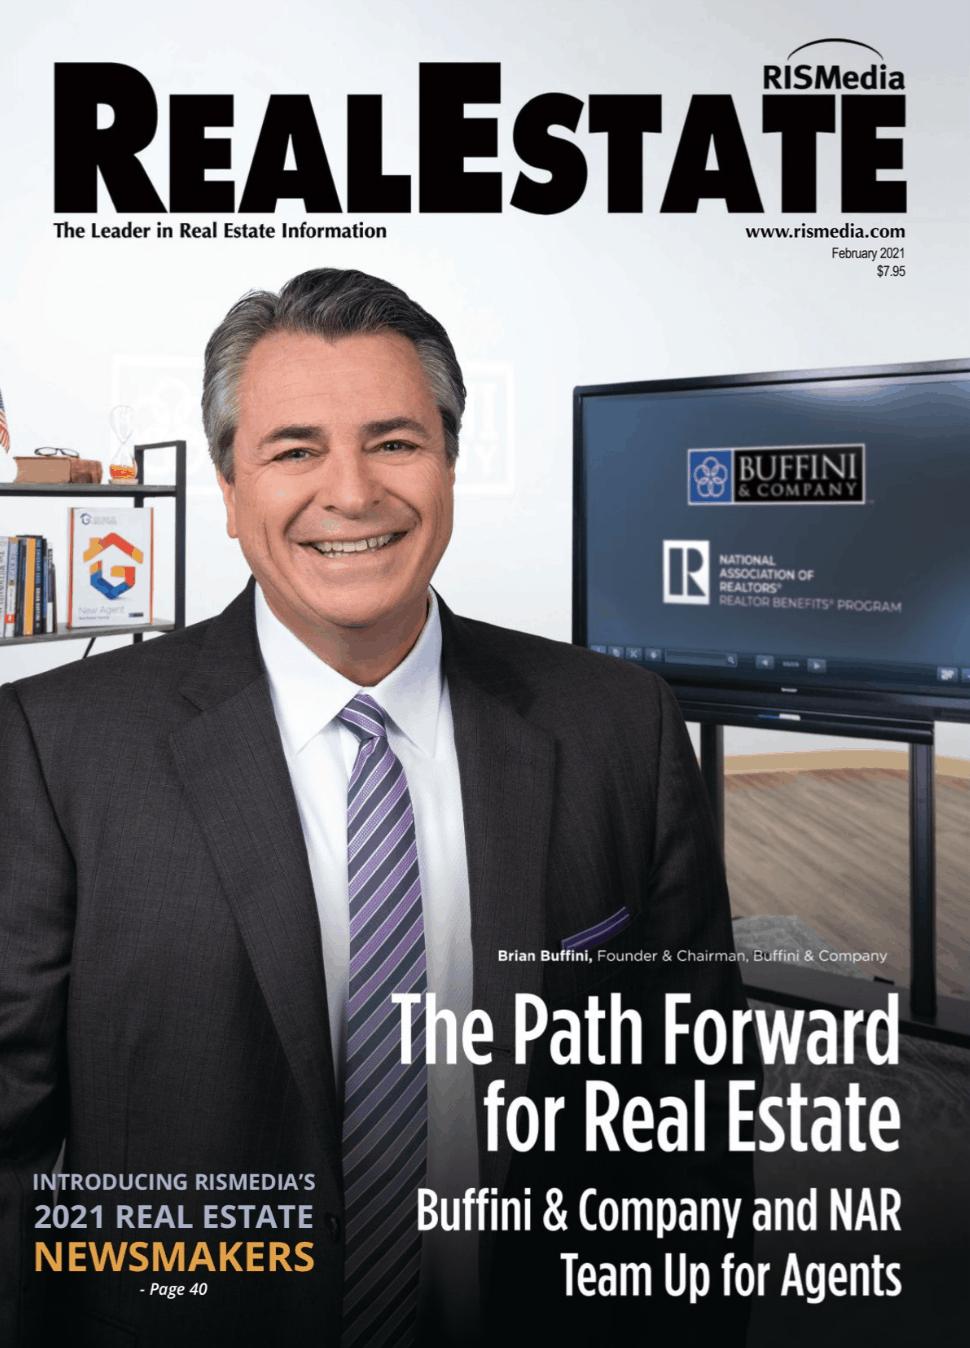 rismedia february 2021 magazine cover